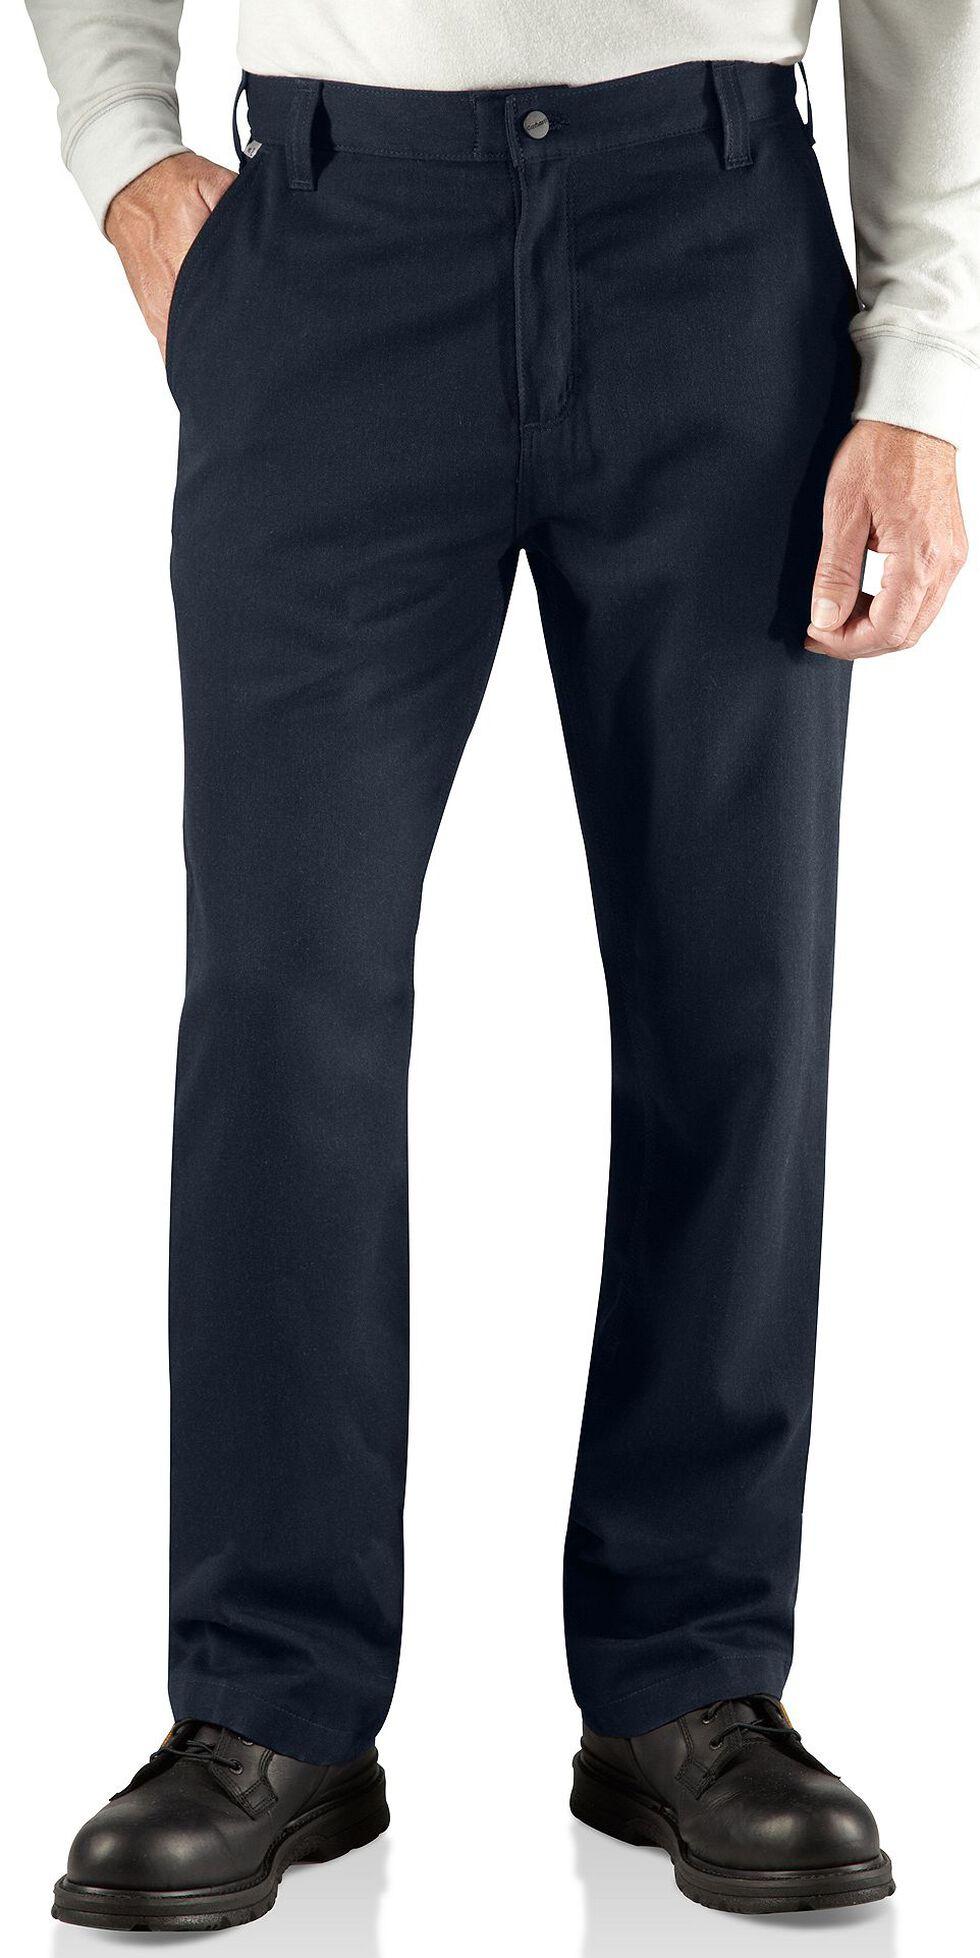 Carhartt Flame Resistant Work Pants - Big & Tall, Navy, hi-res